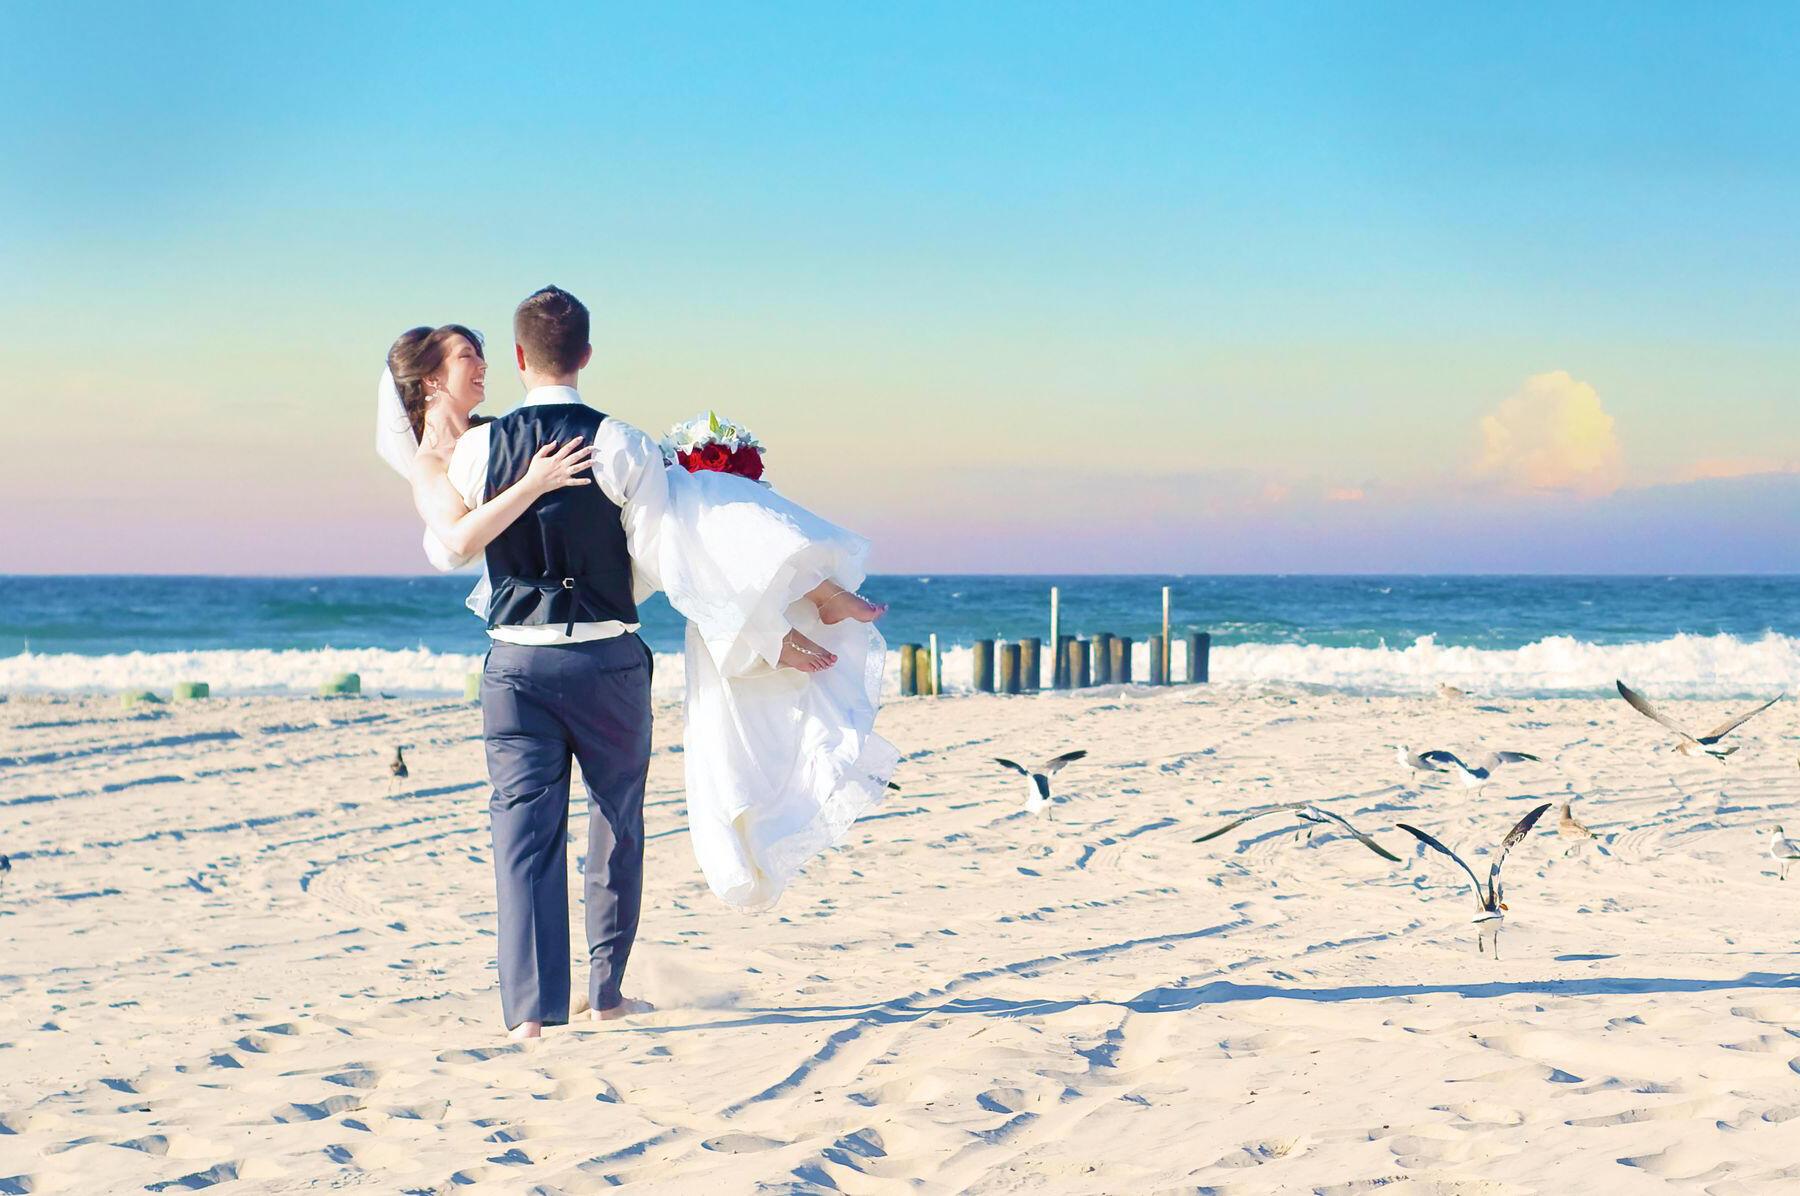 weddings at icona diamond beach